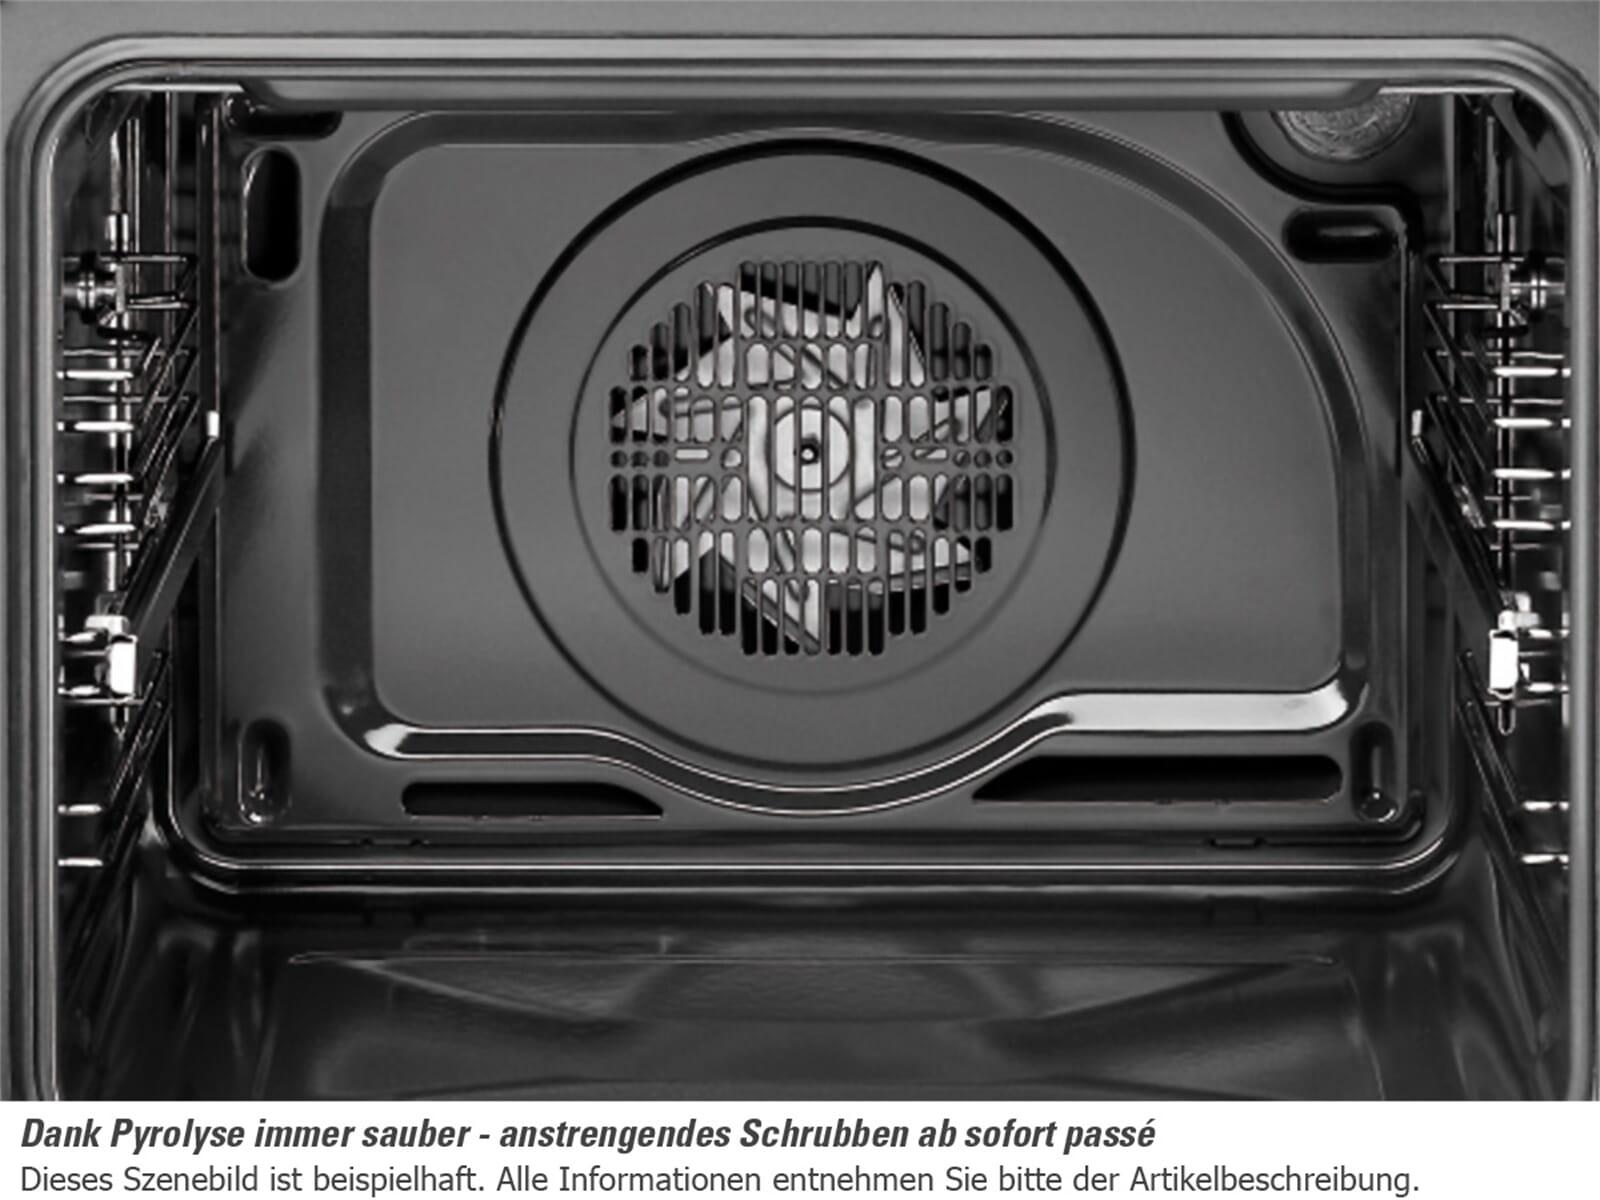 Teka HPE 735 Pyrolyse Backofen Edelstahl